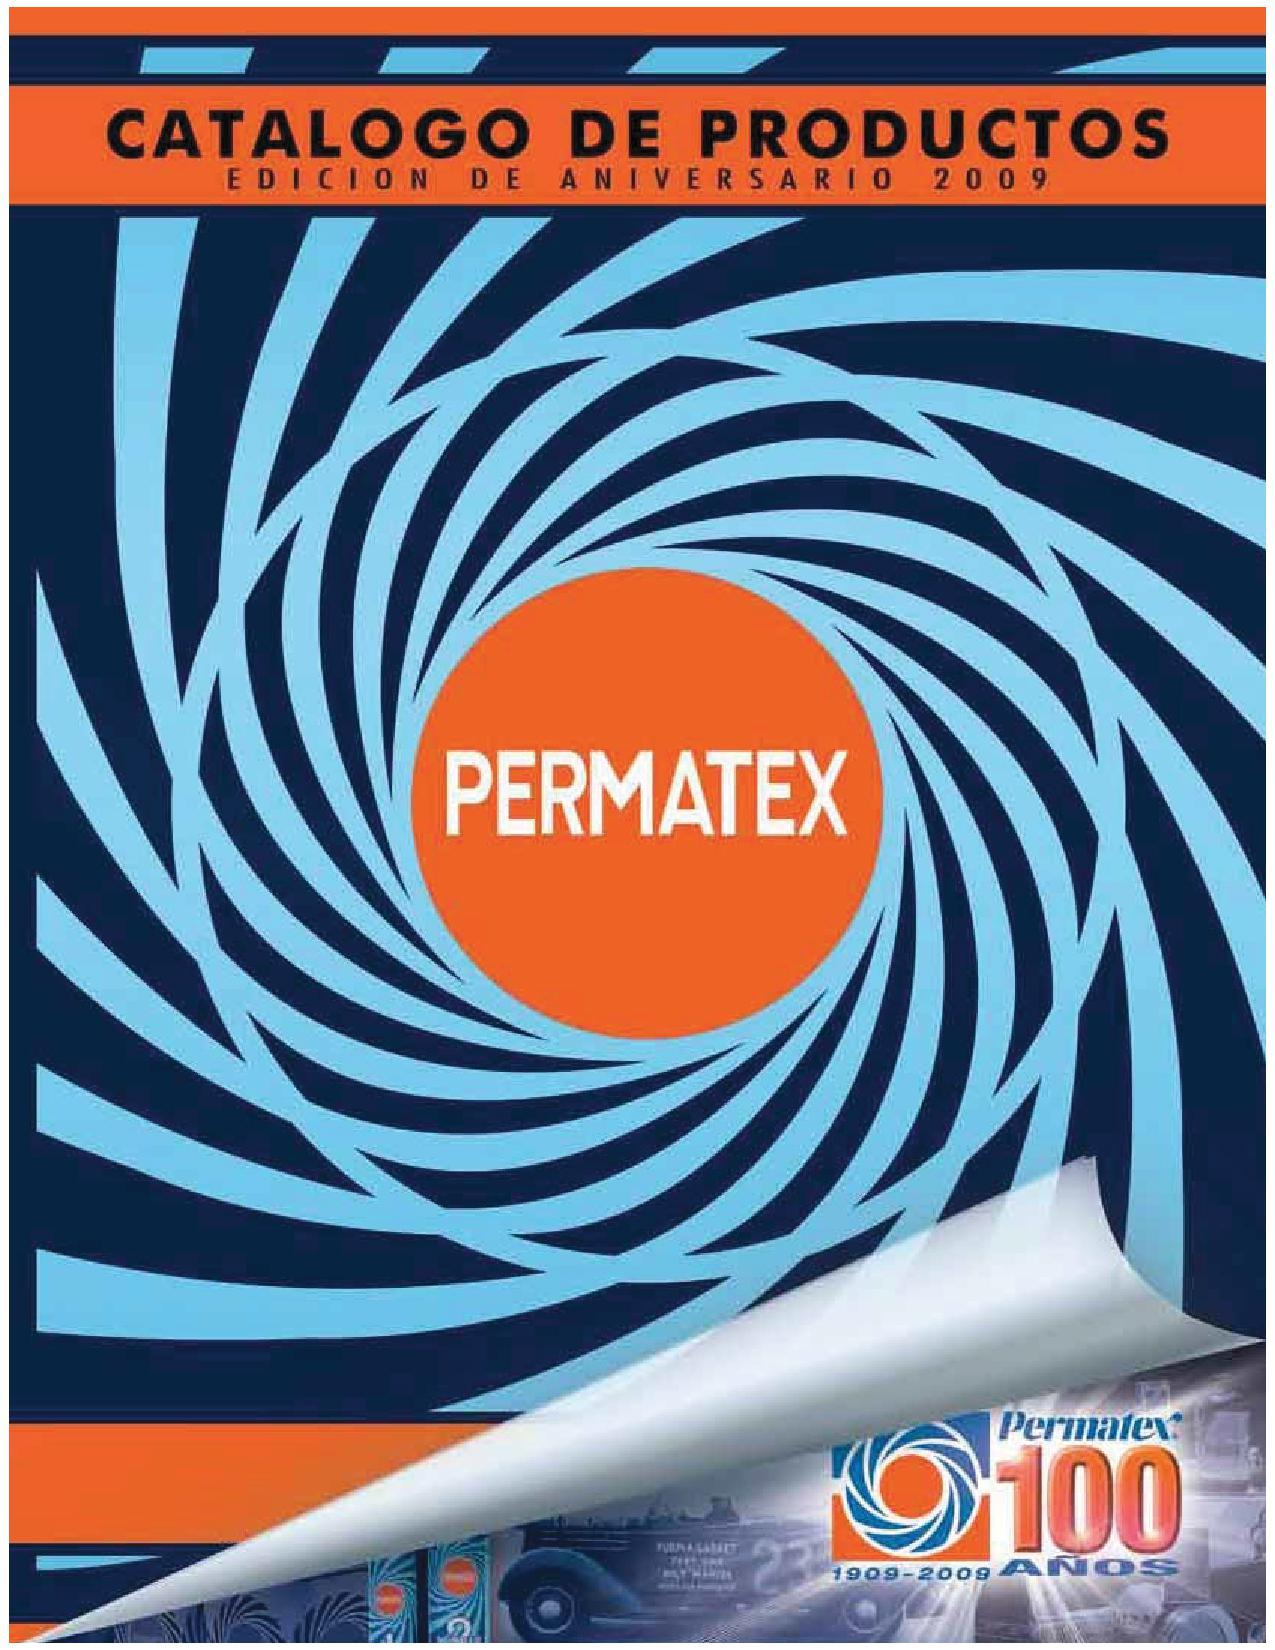 Permatex - Catálogo